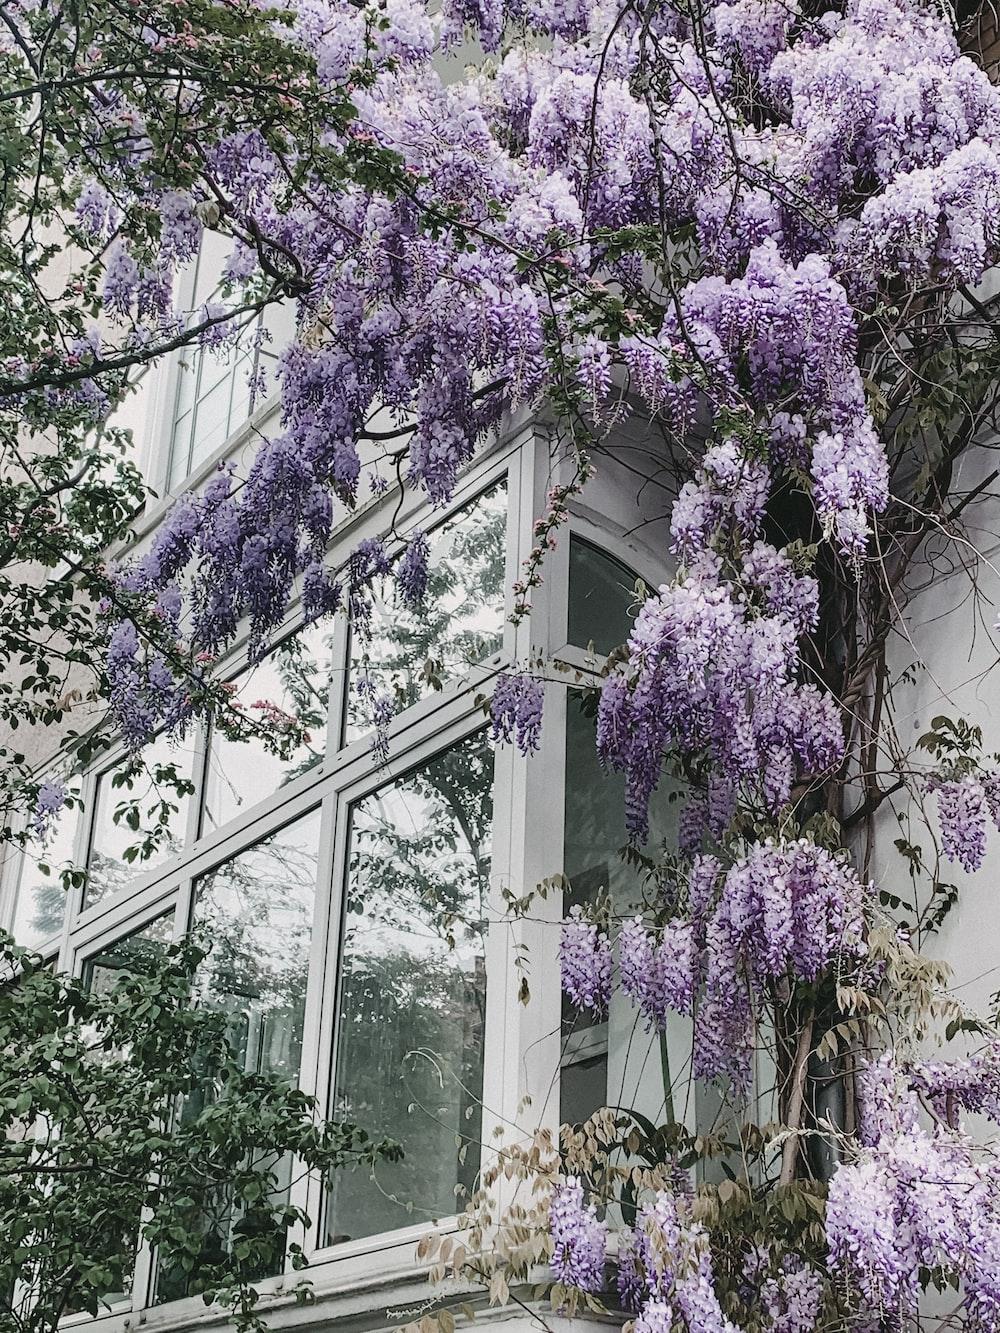 lilac shrubs near glass window